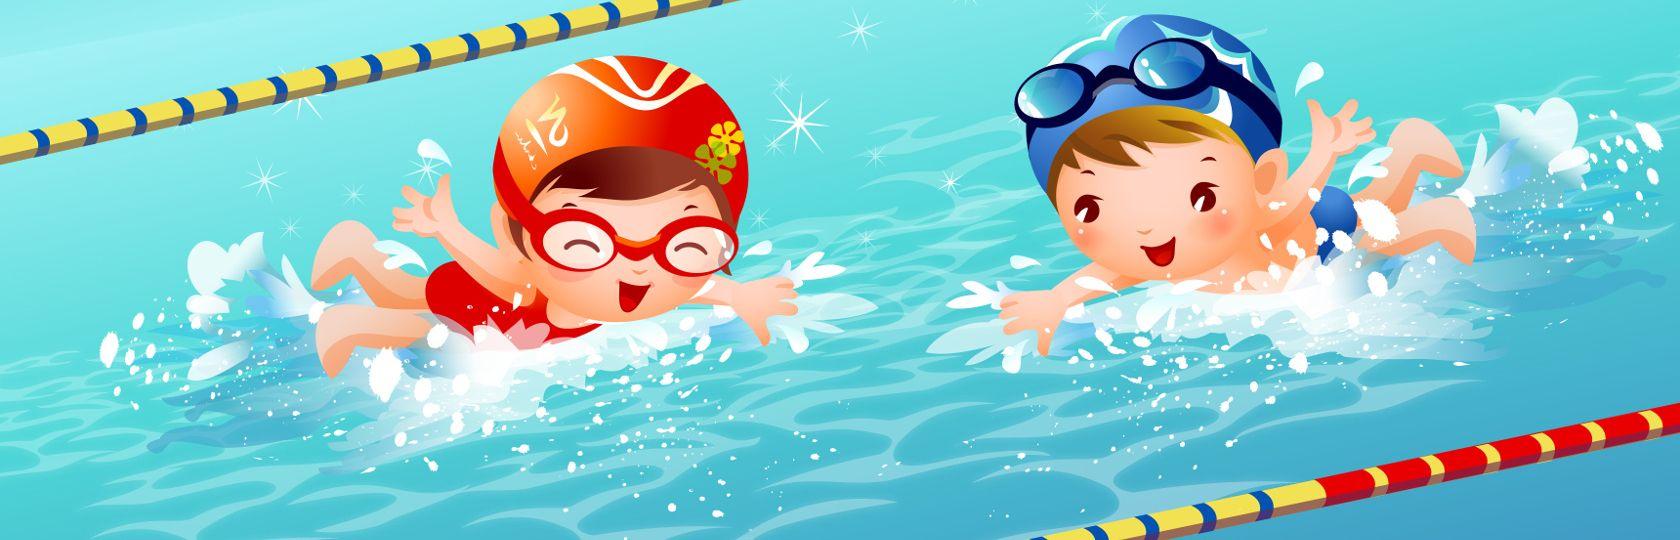 Centro fin mecenate piscina d samuele milano - Corsi per neonati in piscina ...